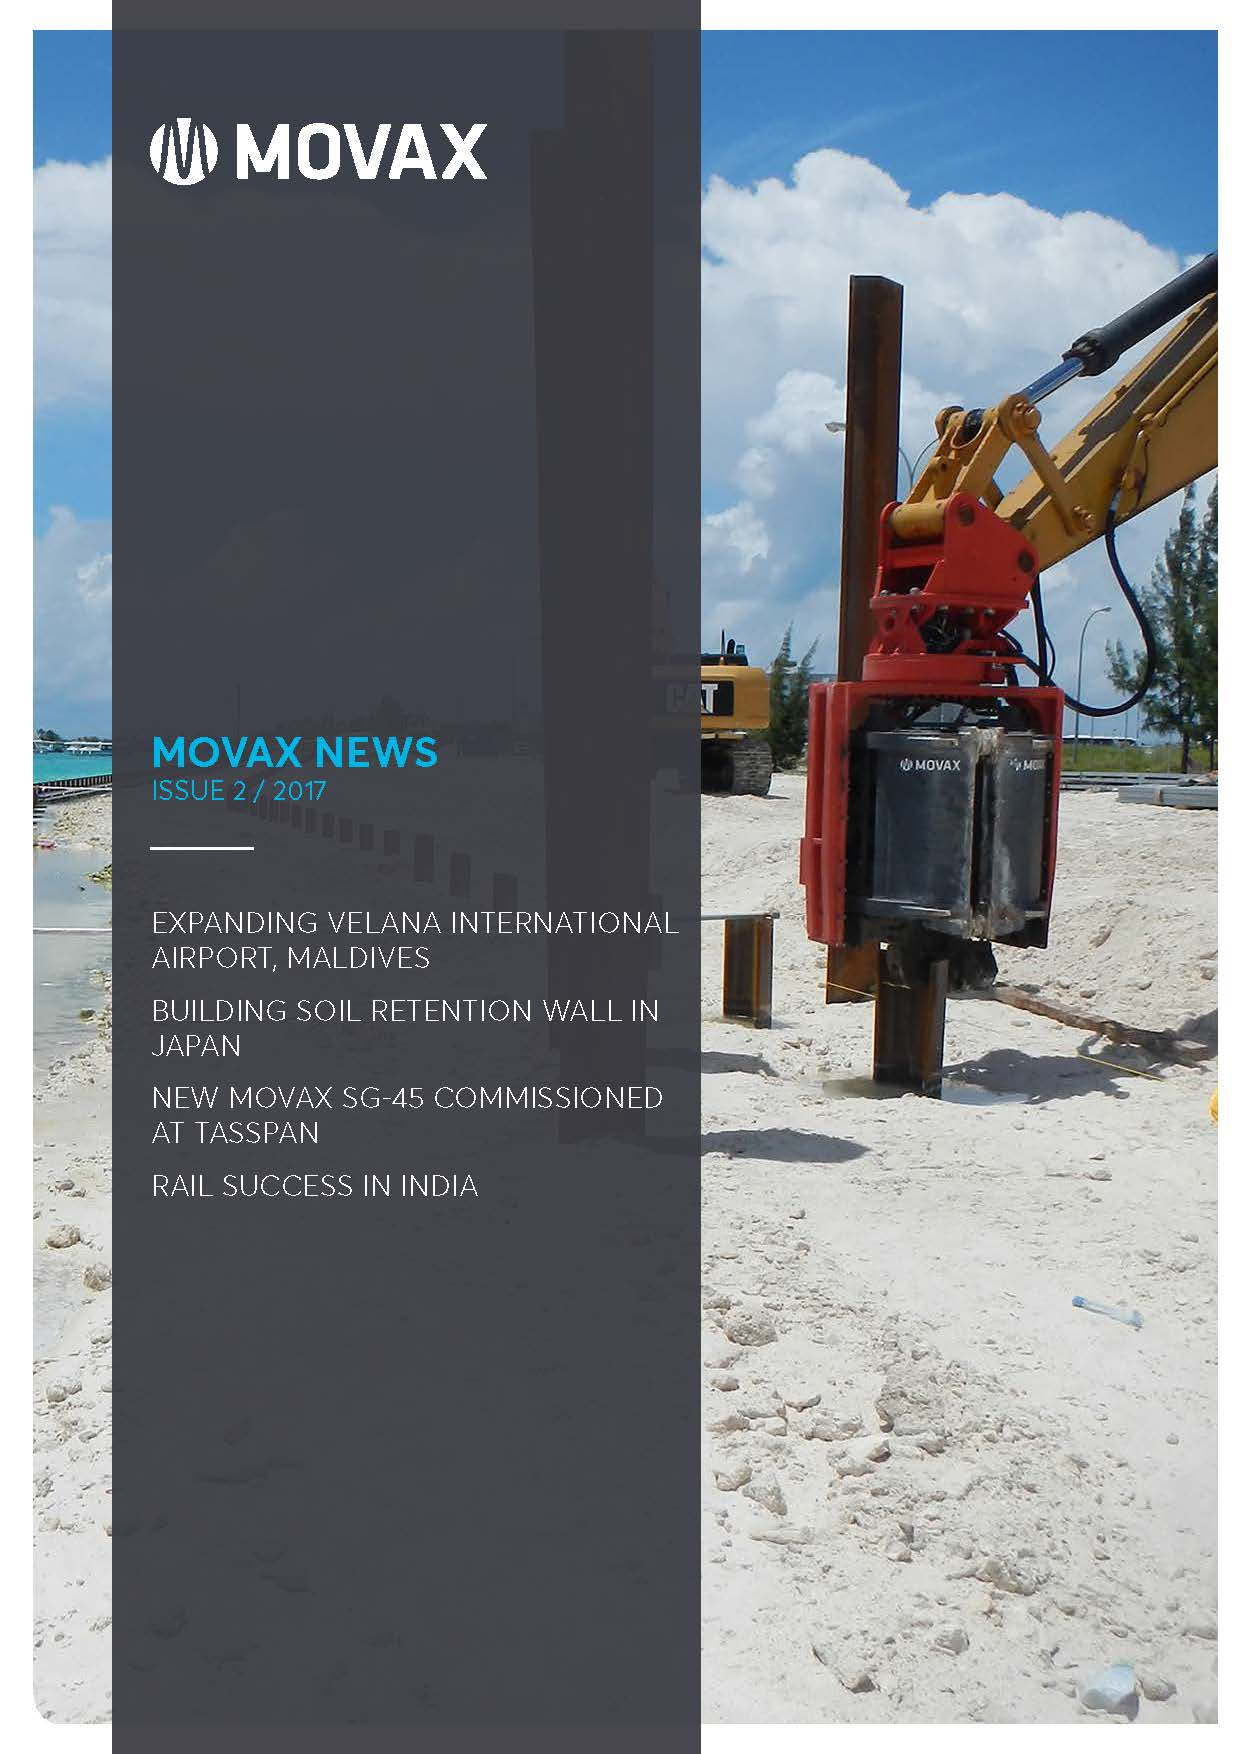 Movax News 02/2017